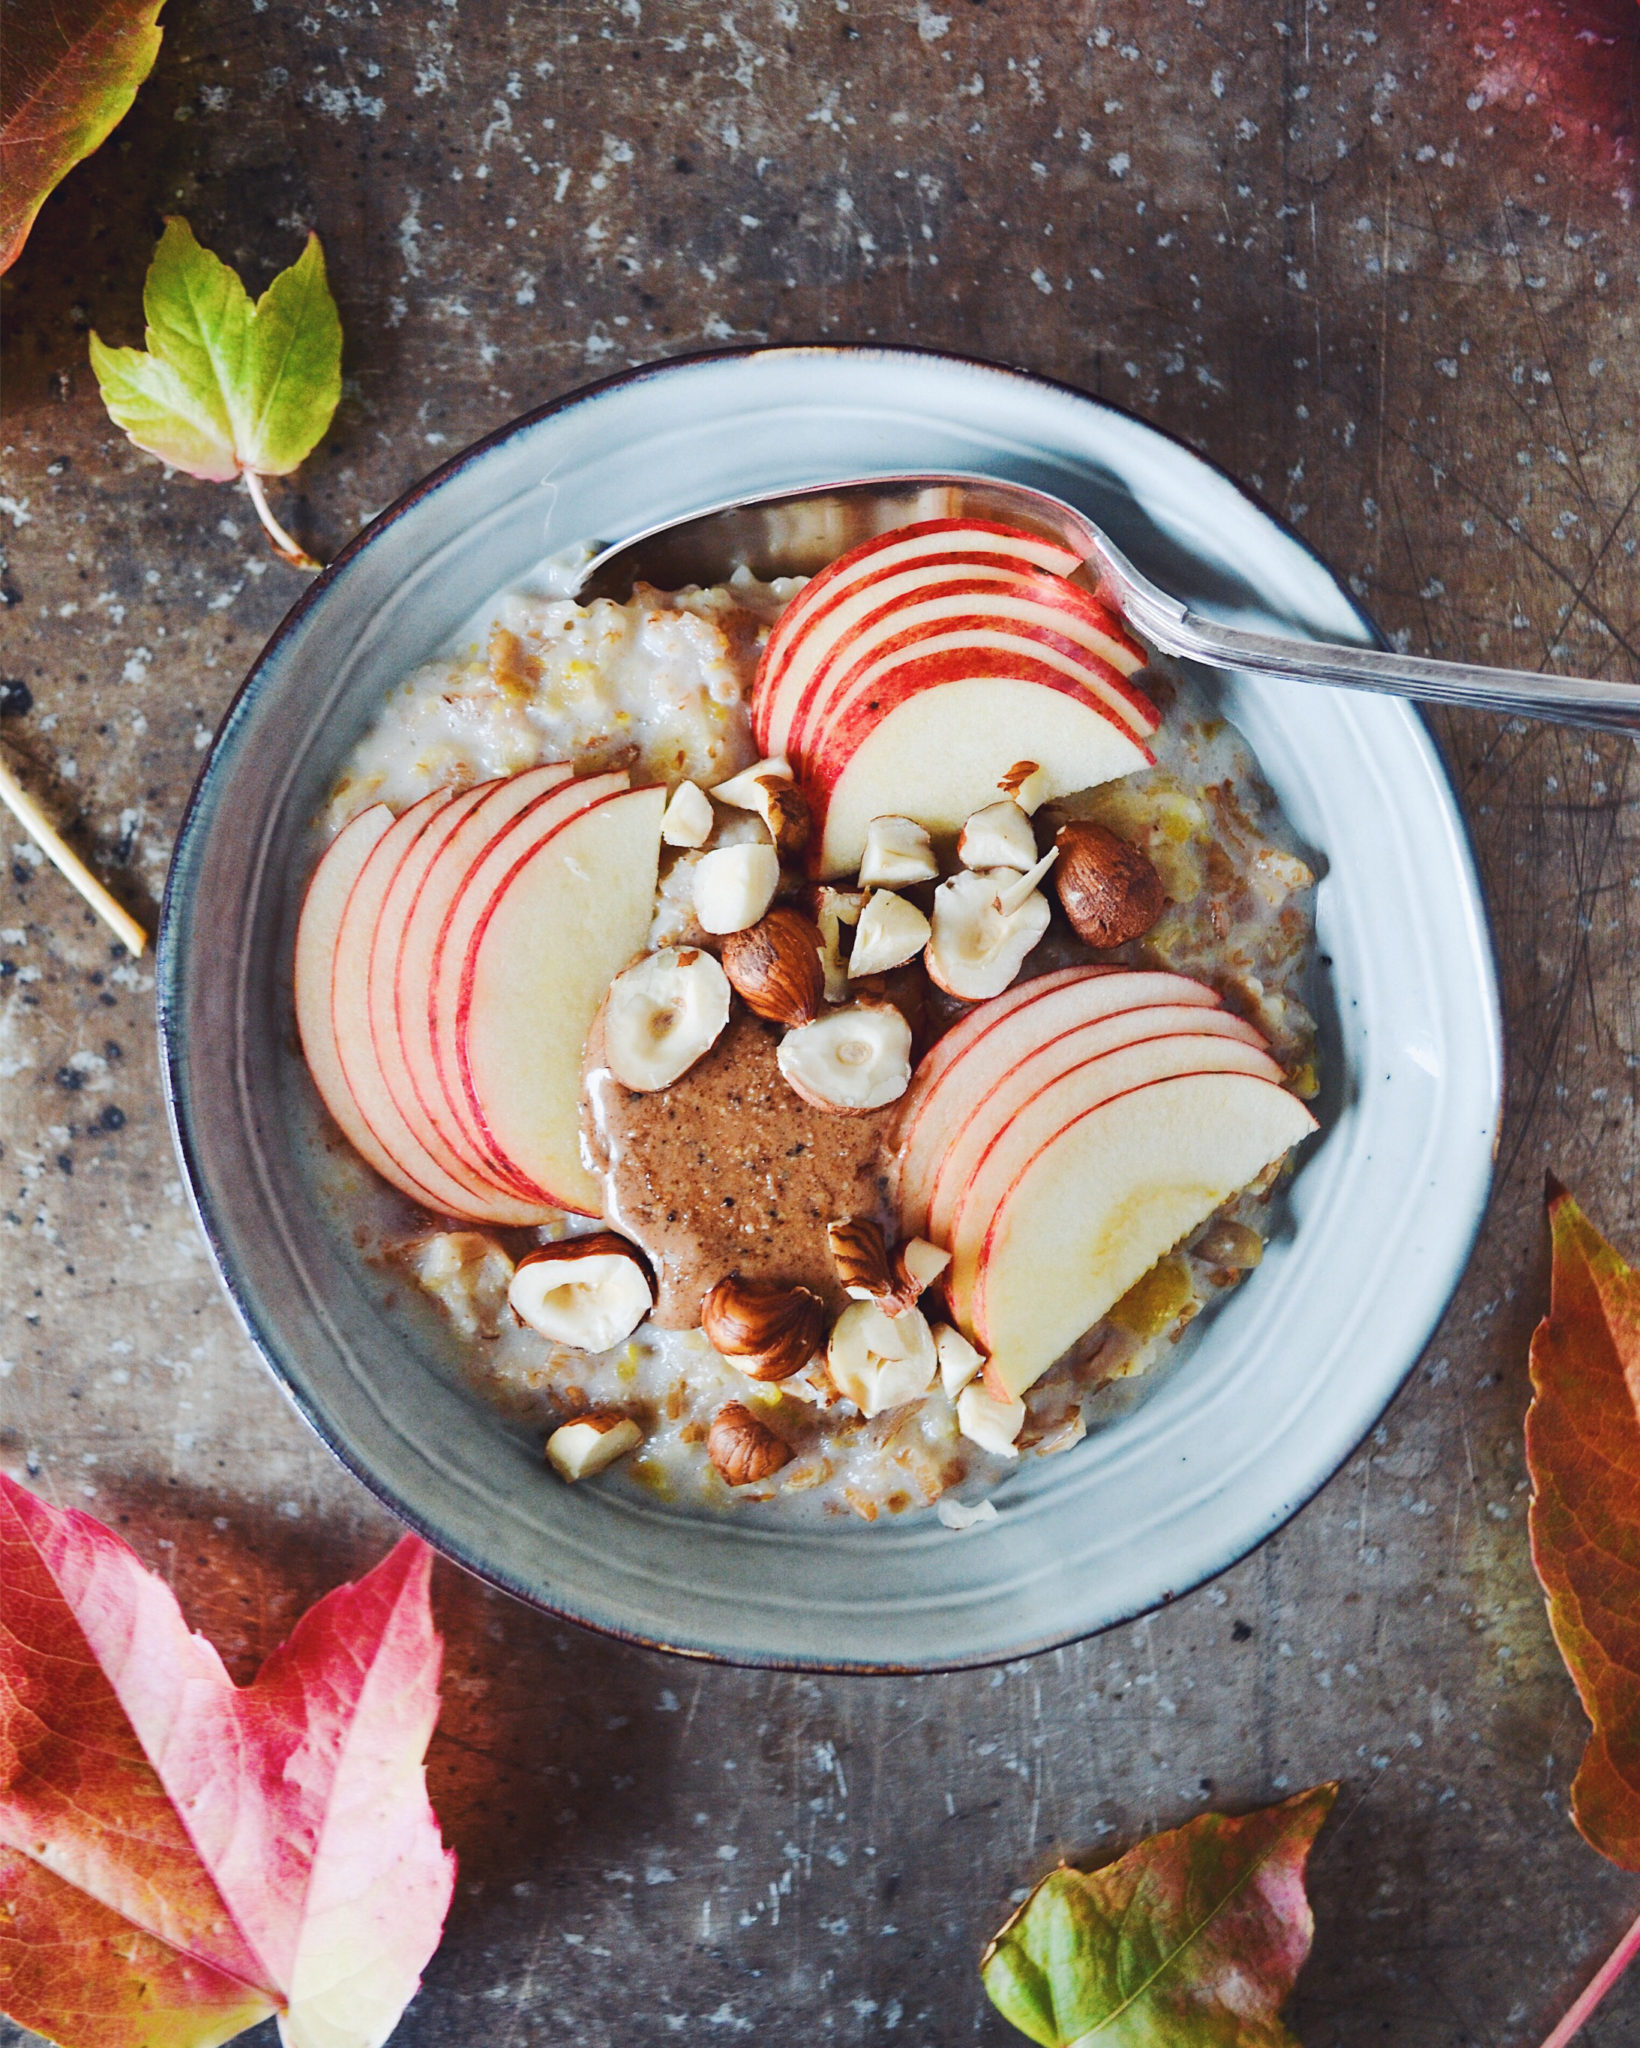 Mysligrød med æble og nougat nøddesmør efterårsgrød morgenmad